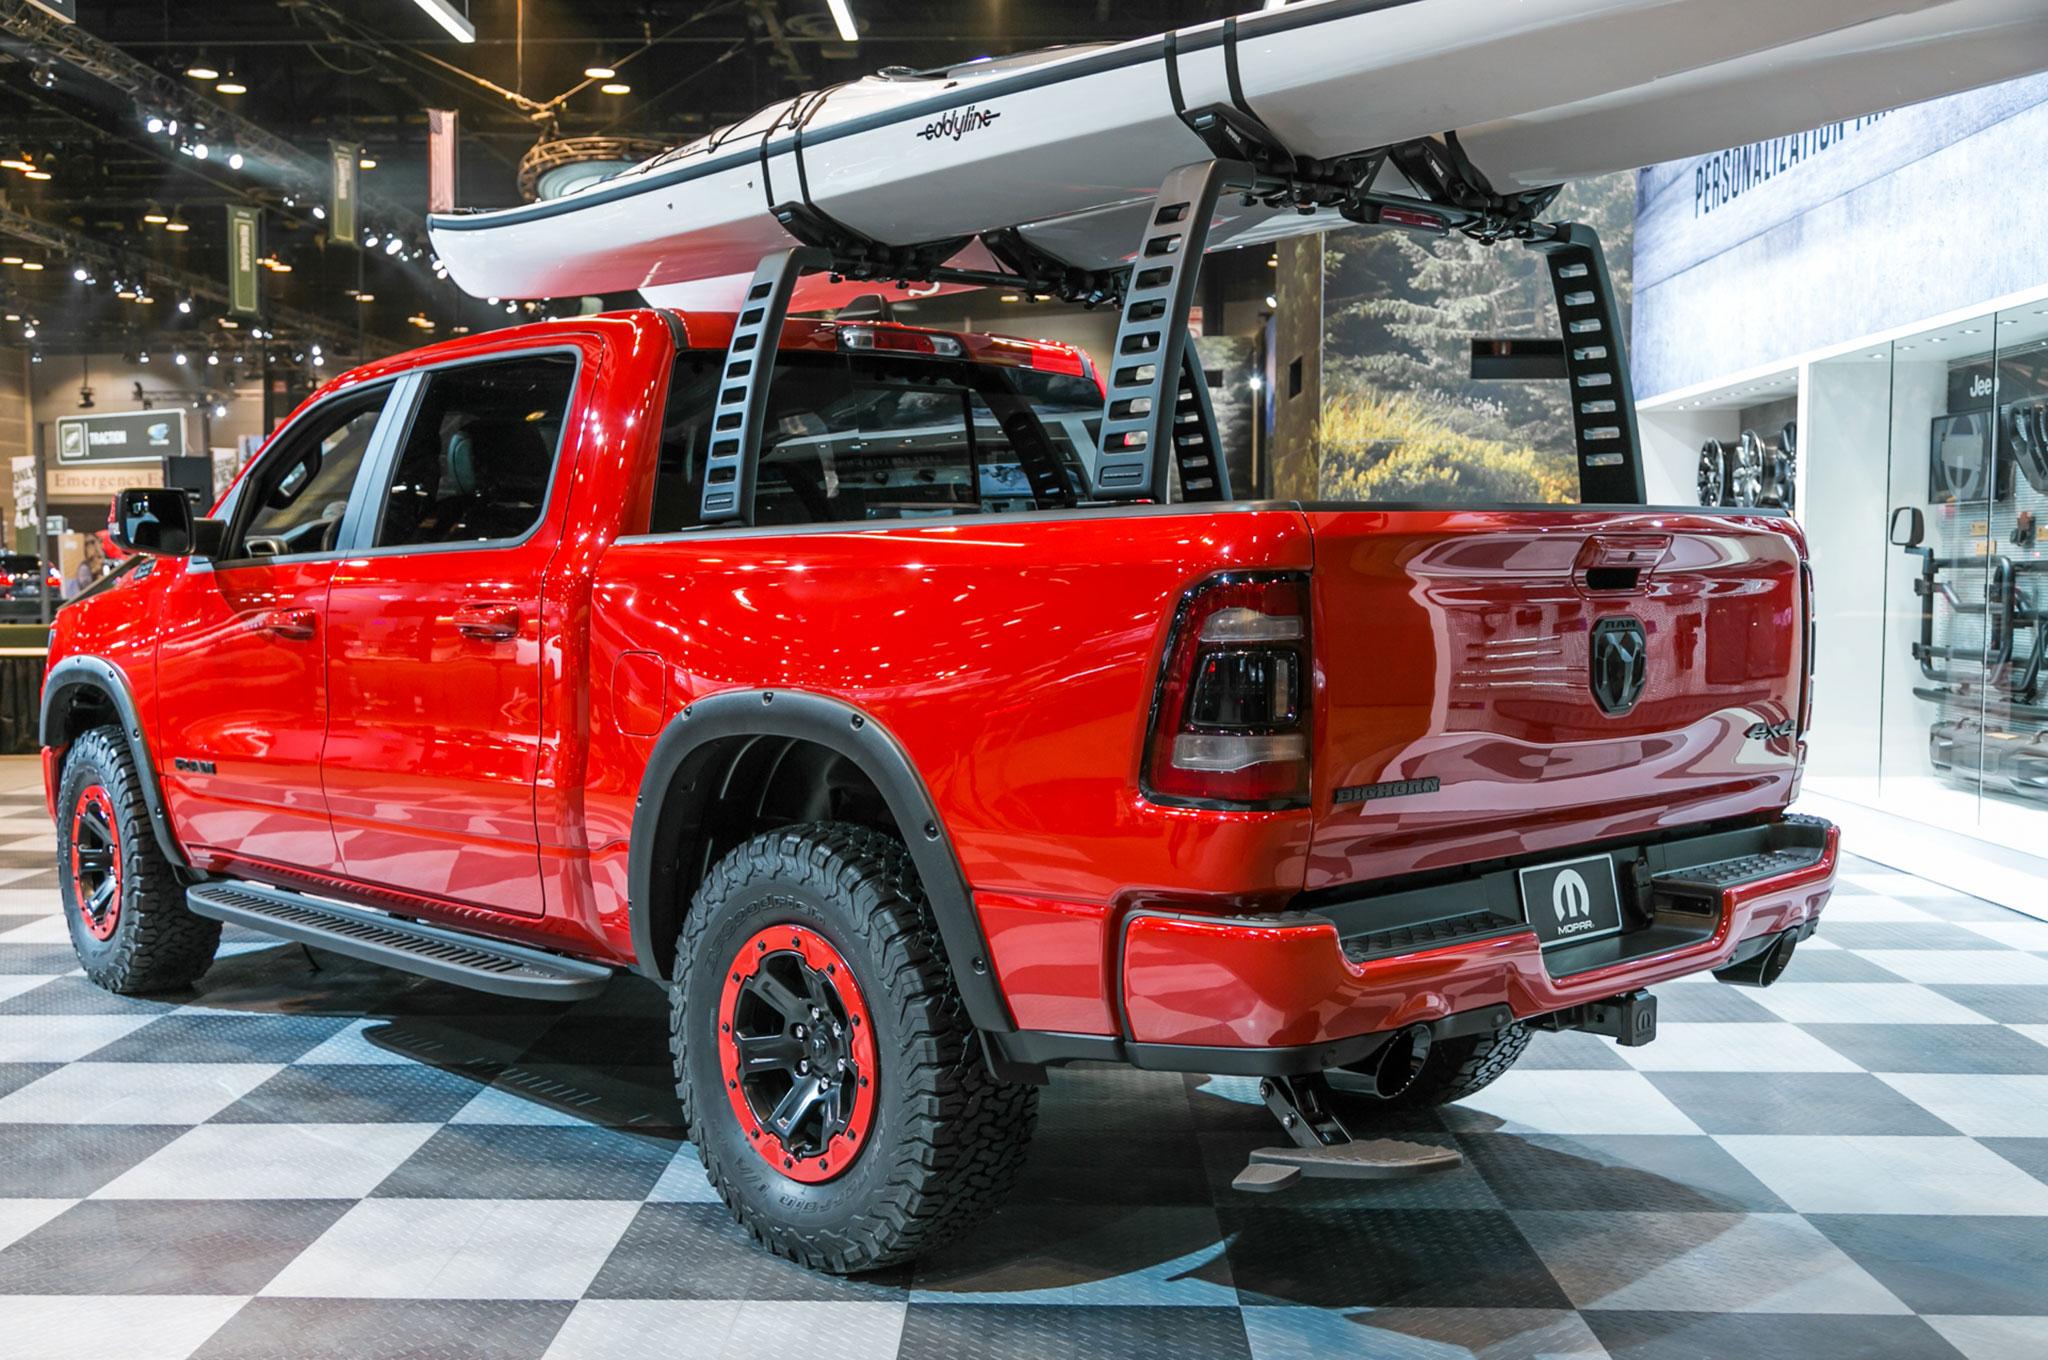 Mopar Preps 2019 Ram 1500 for Adventure | Automobile Magazine